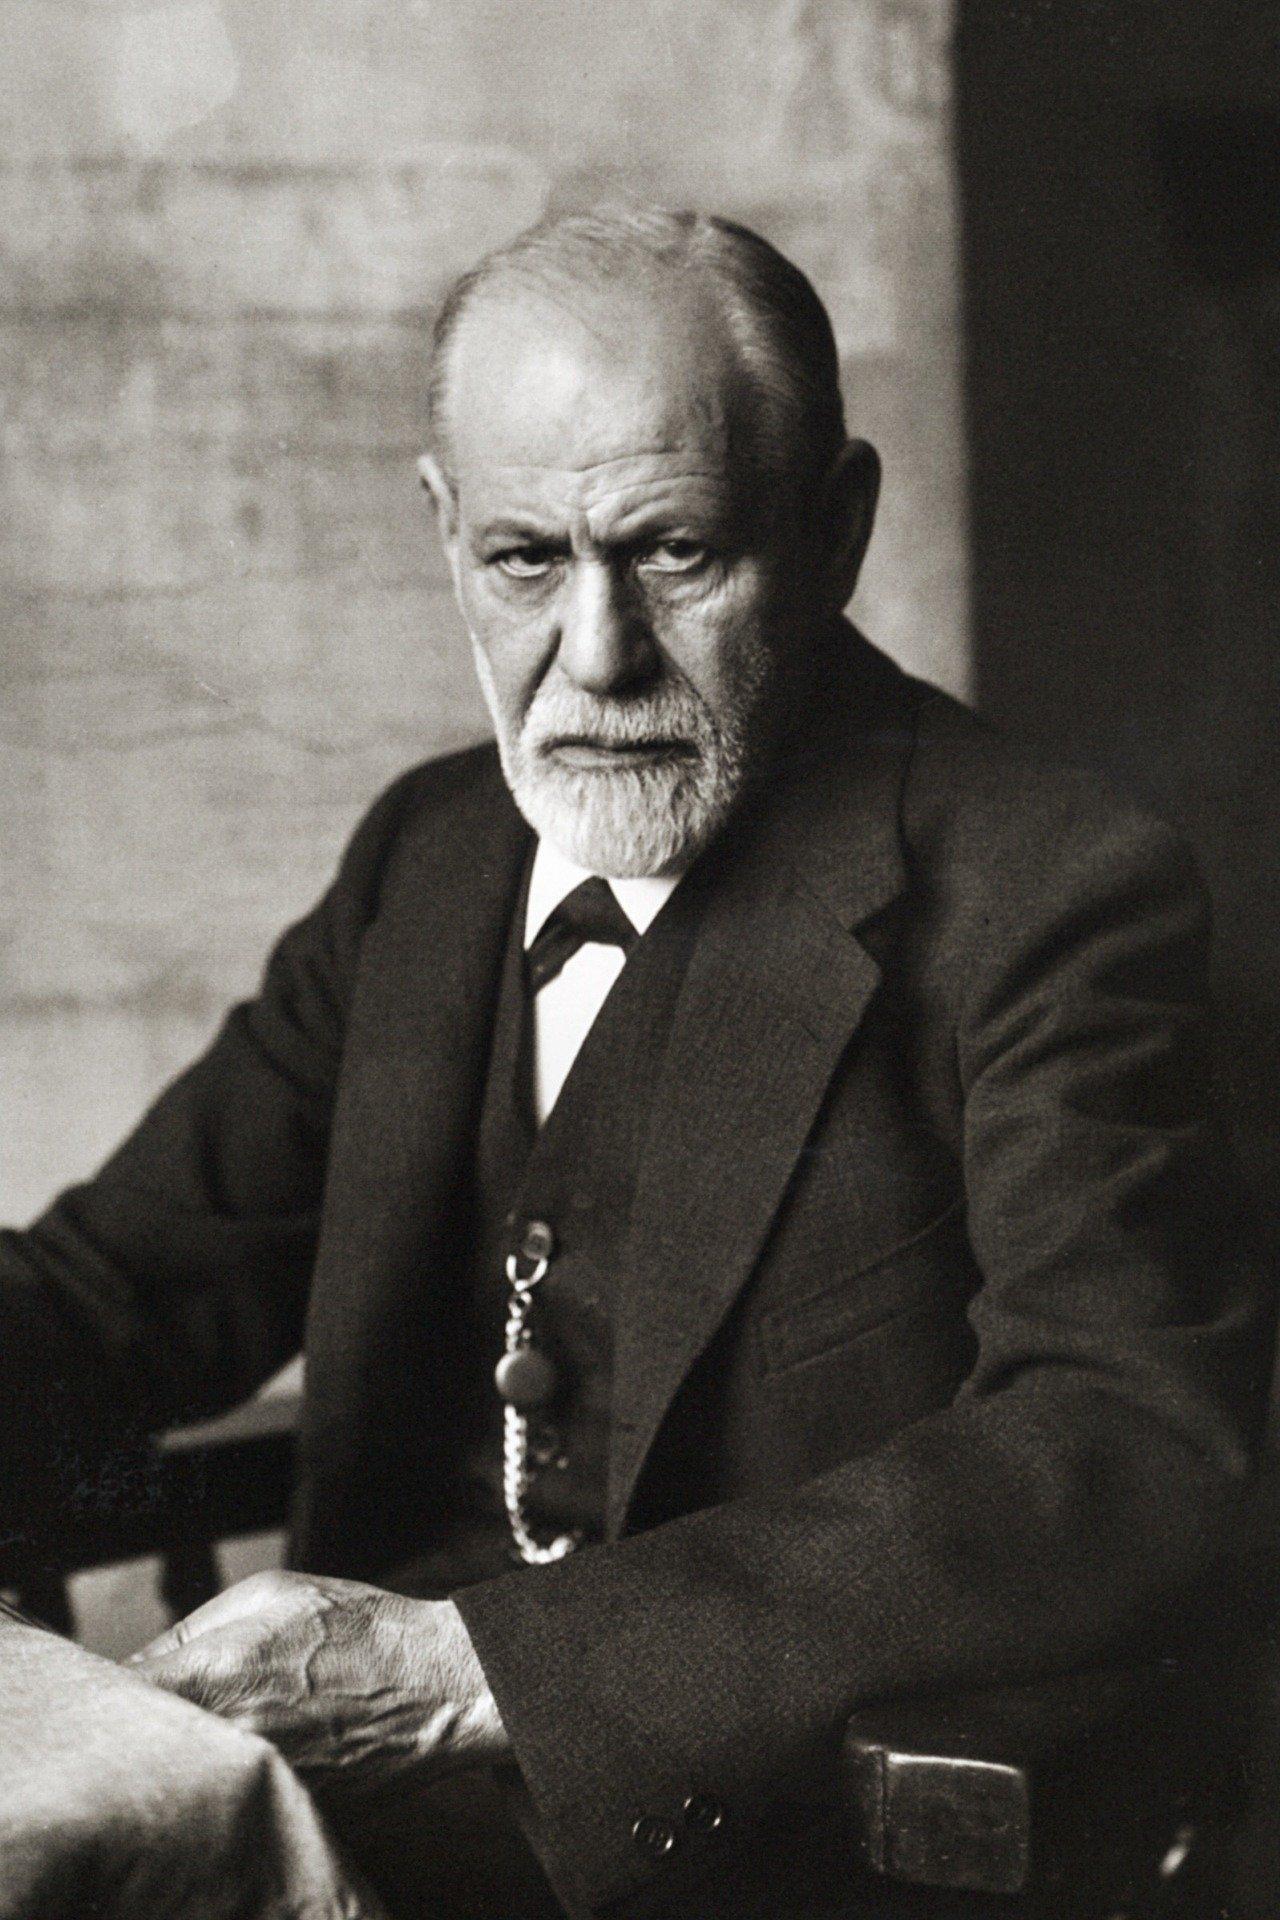 Sigmund Freud sat in a chair